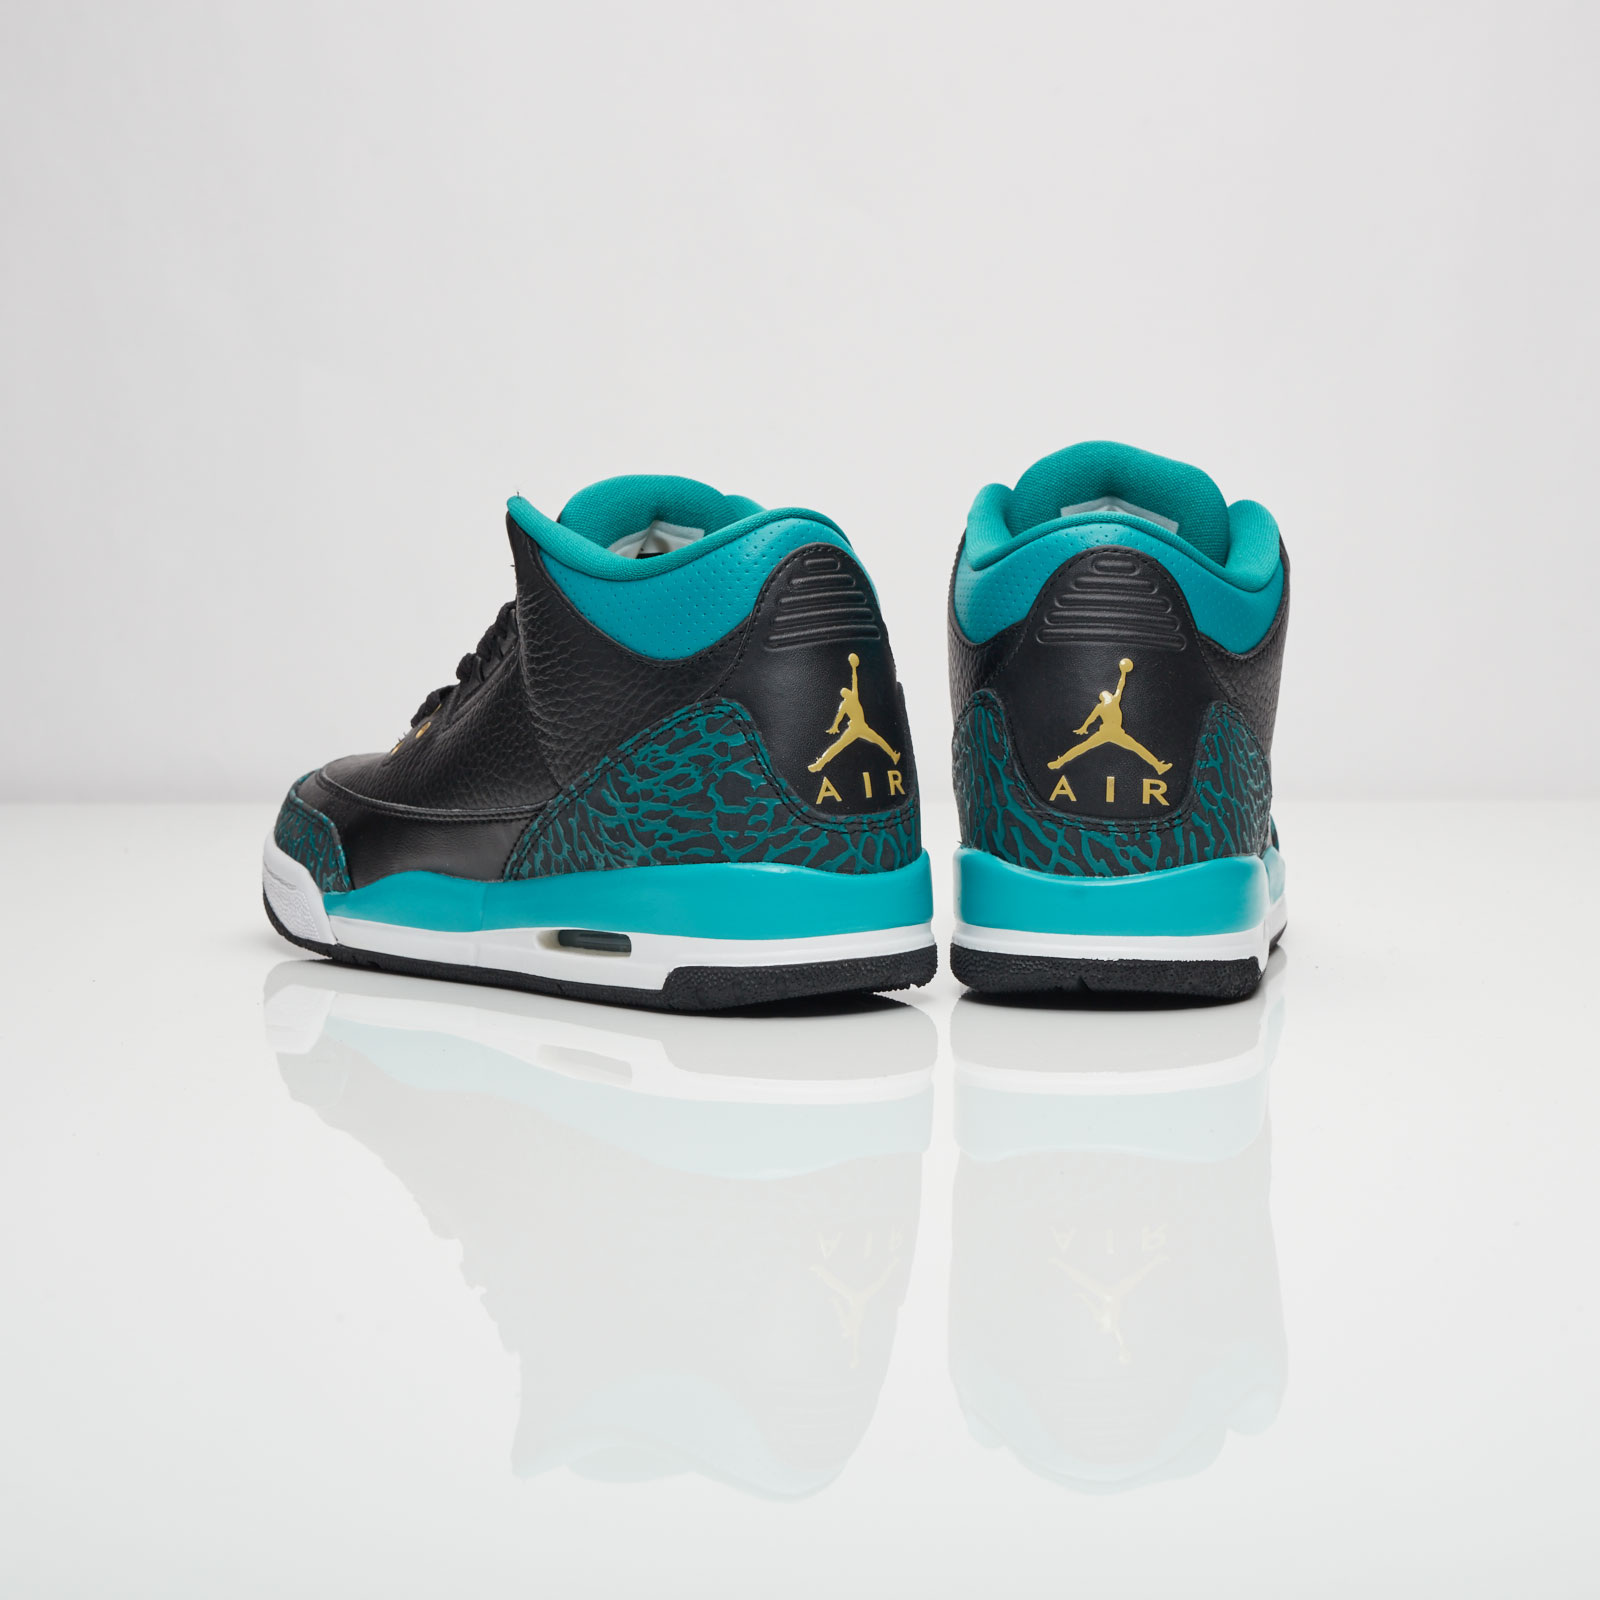 ddd9d3ebd189 Jordan Brand Air Jordan 3 Retro (Gs) - 441140-018 - Sneakersnstuff ...